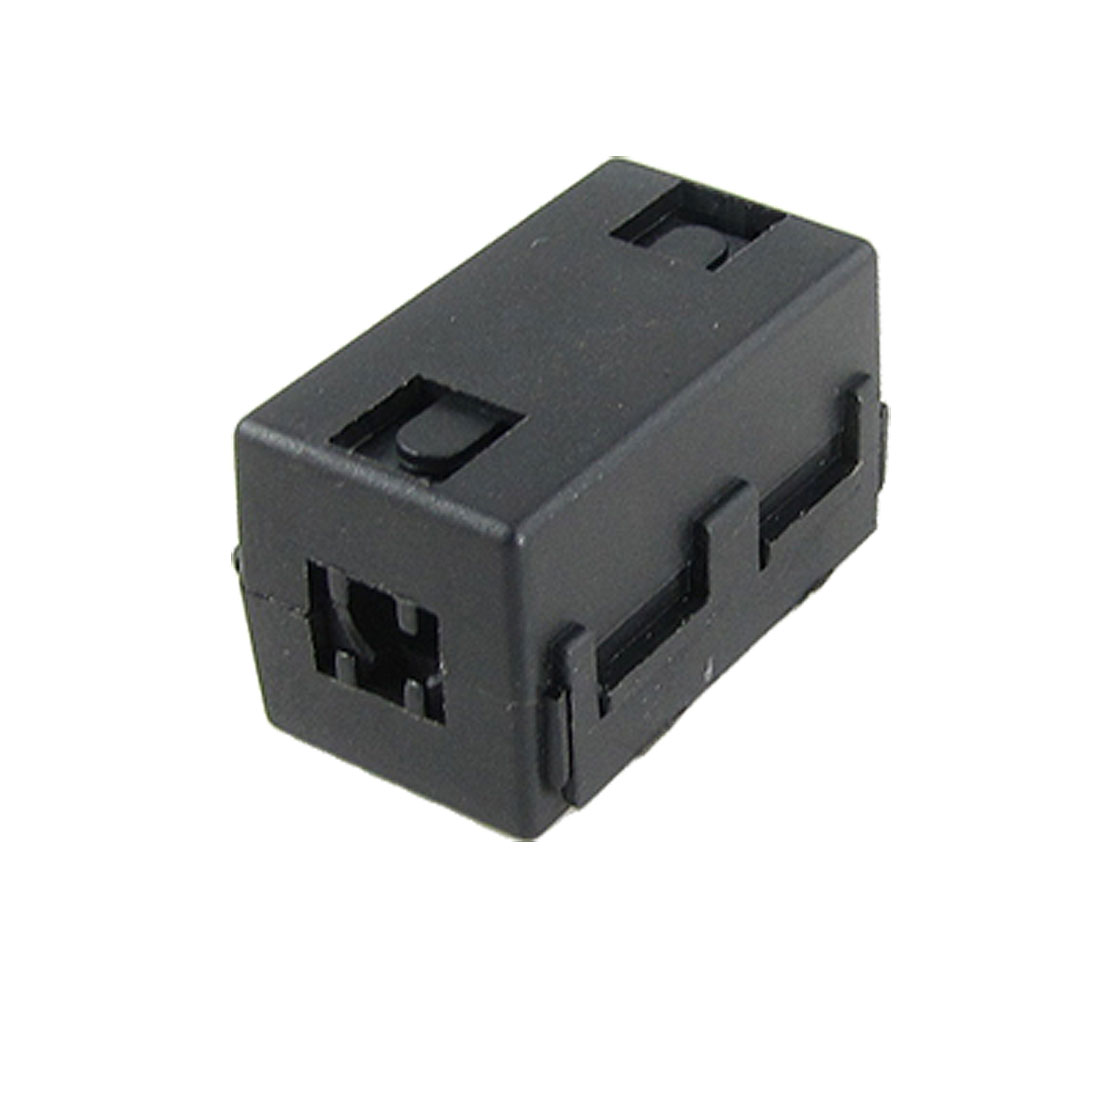 UF65 6.5mm Diameter Cable Clip on Ferrite Core 10 Pcs